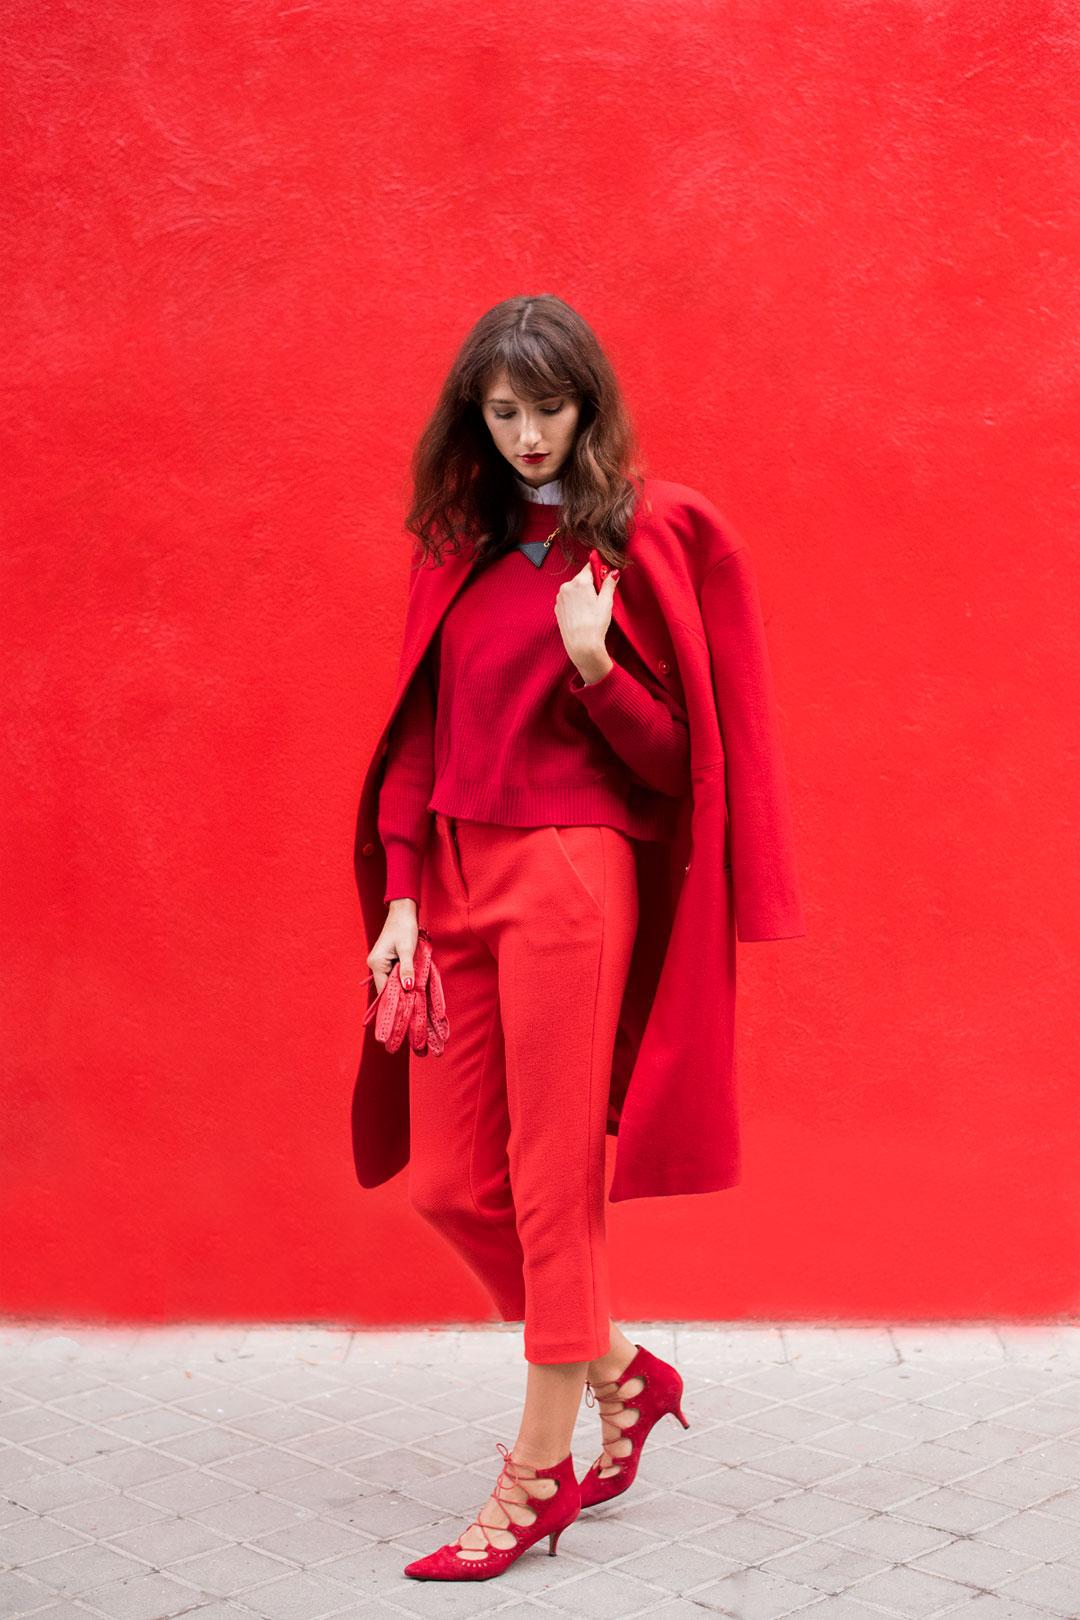 red-bow-tie-guerlain-streetstyle-mitmeblog-web-03